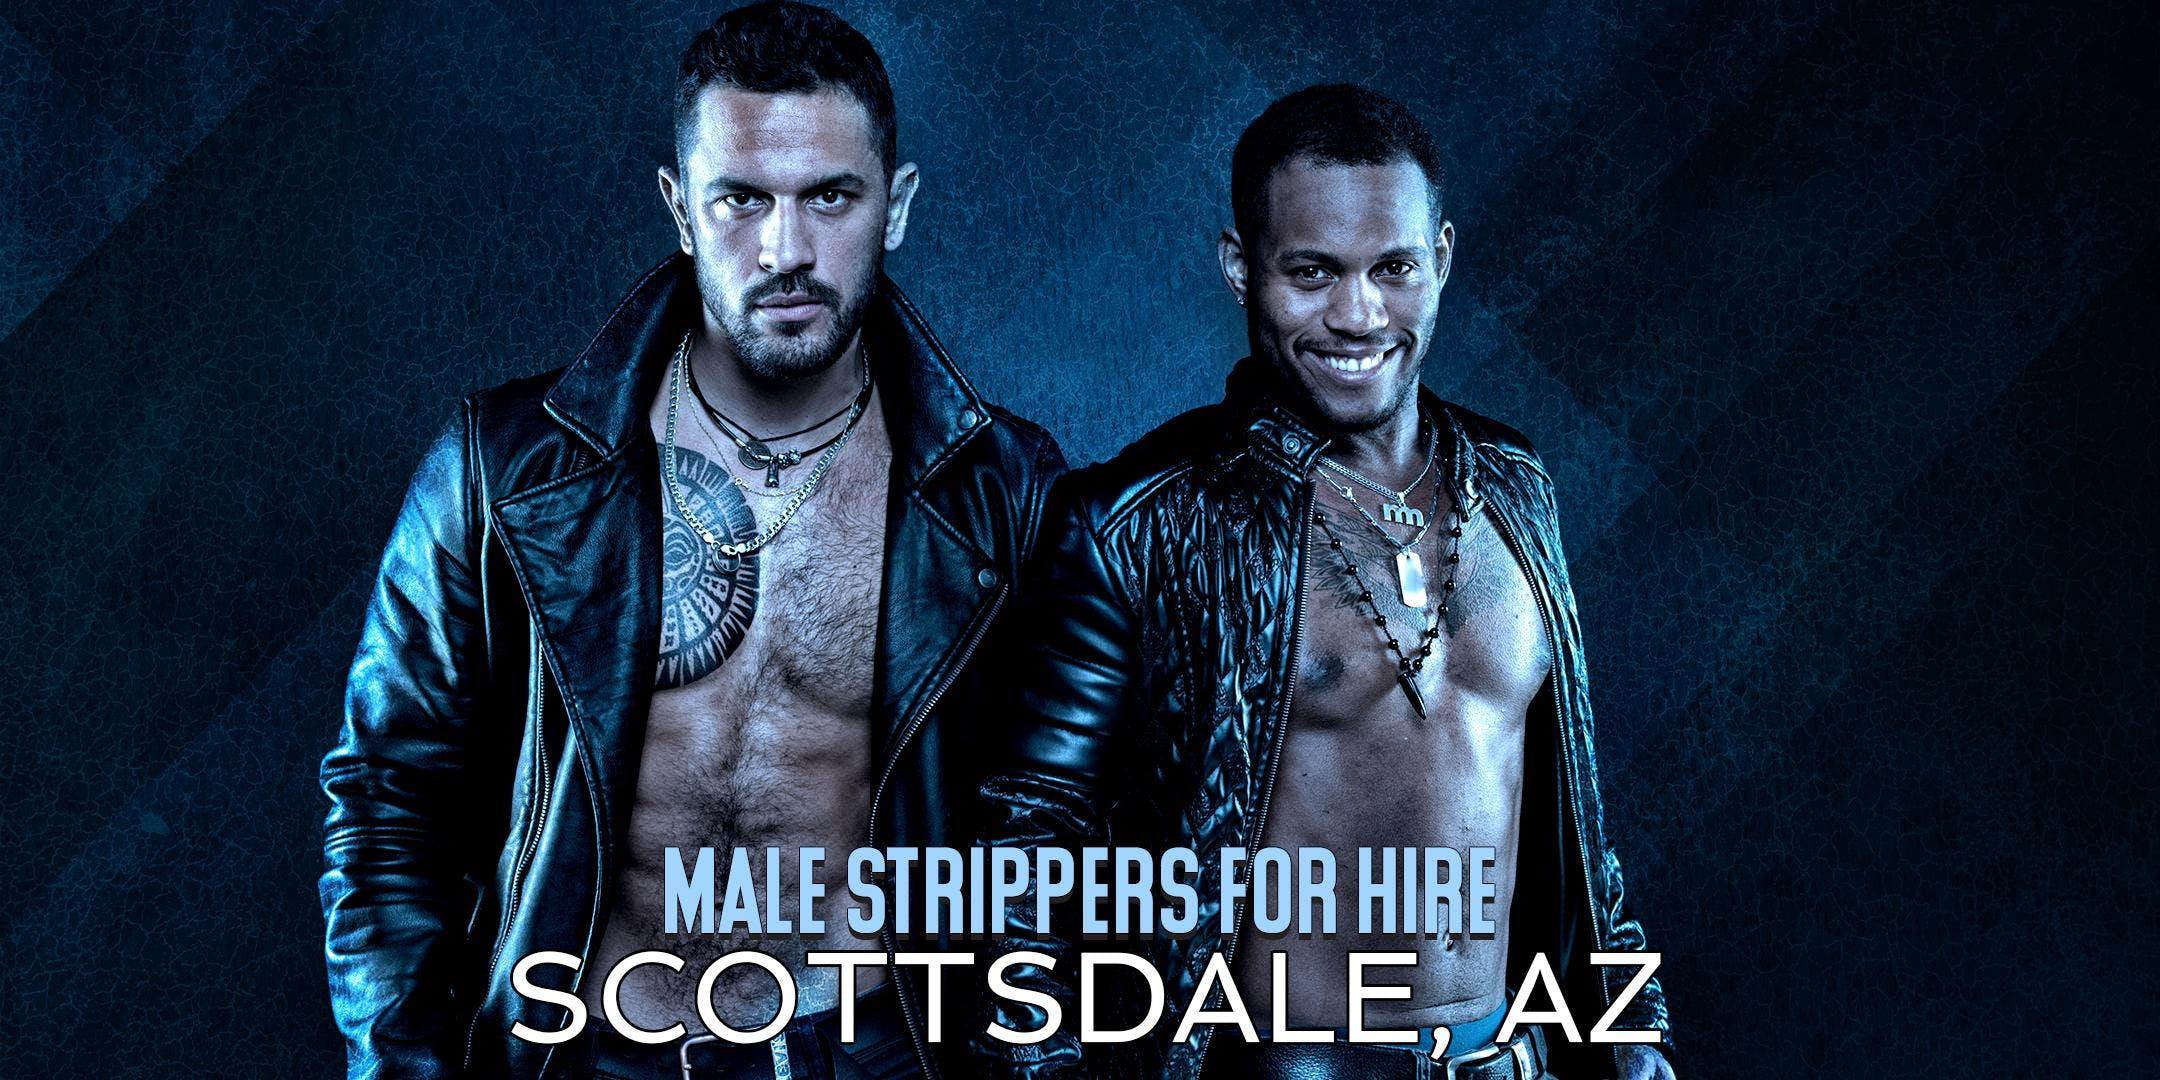 Hire a Male Stripper Scottsdale AZ - Private Party Male Strippers for Hire Scottsdale